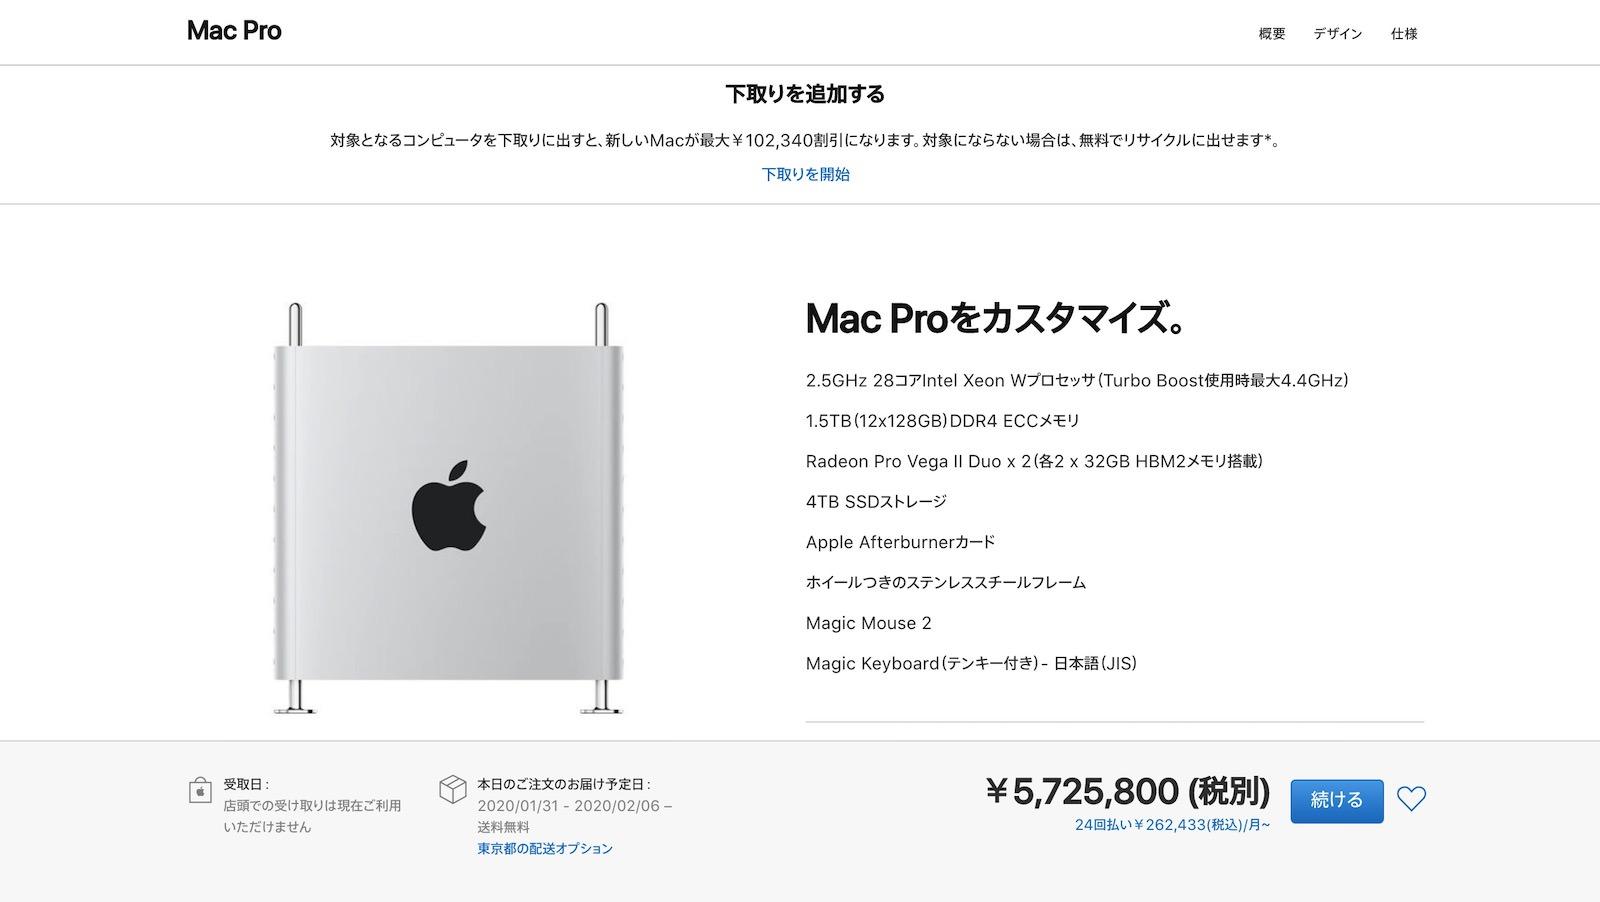 Mac-Pro-2019-full-spec-model.jpg